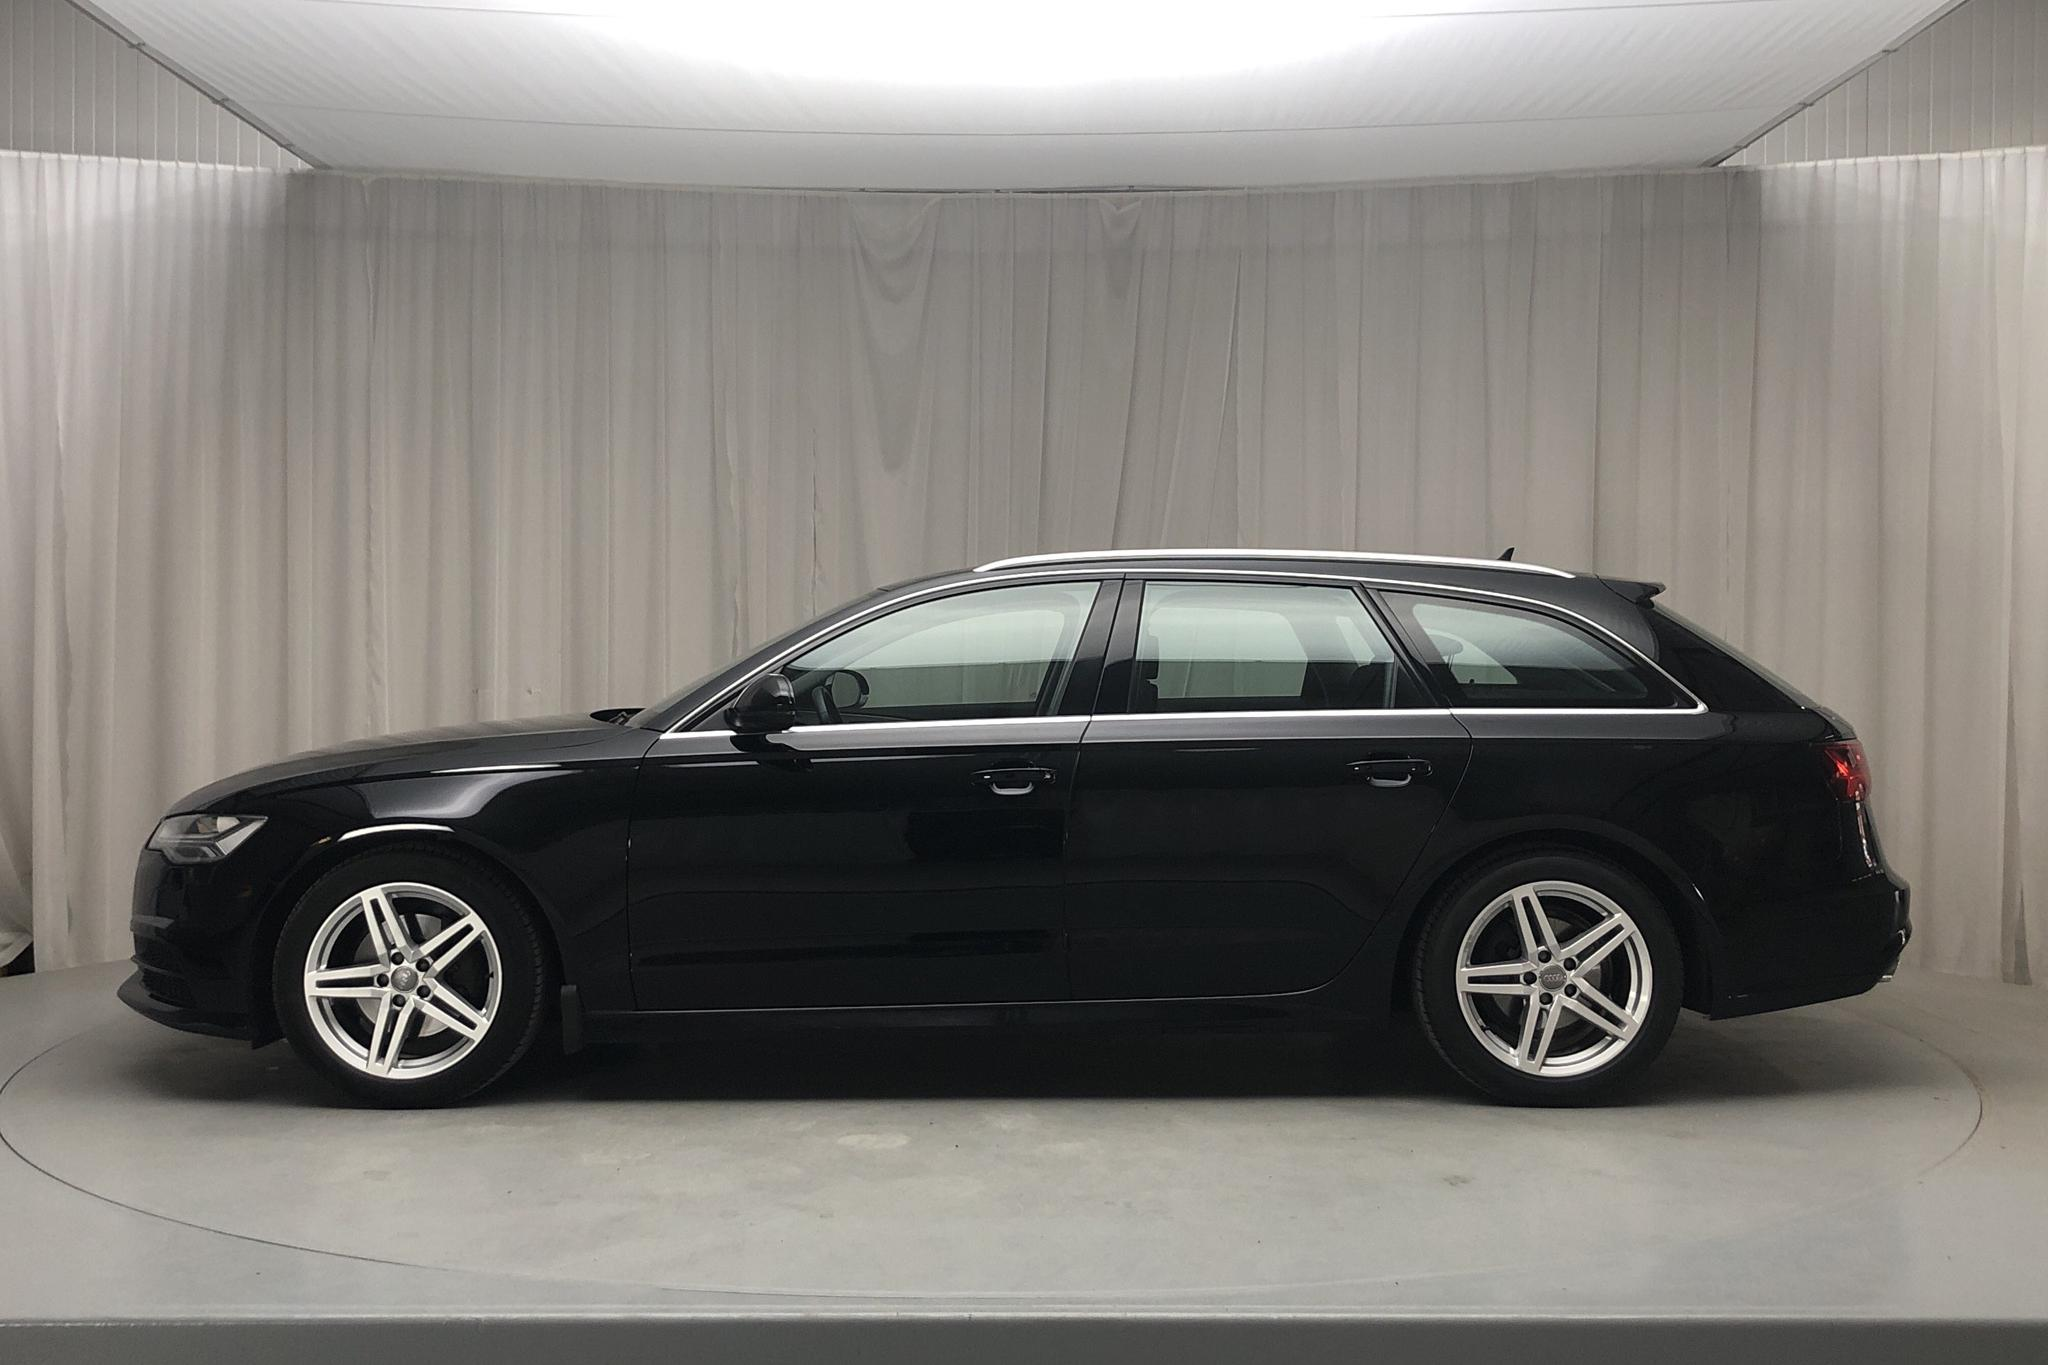 Audi A6 2.0 TDI Avant (190hk) - 9 131 mil - Automat - svart - 2018